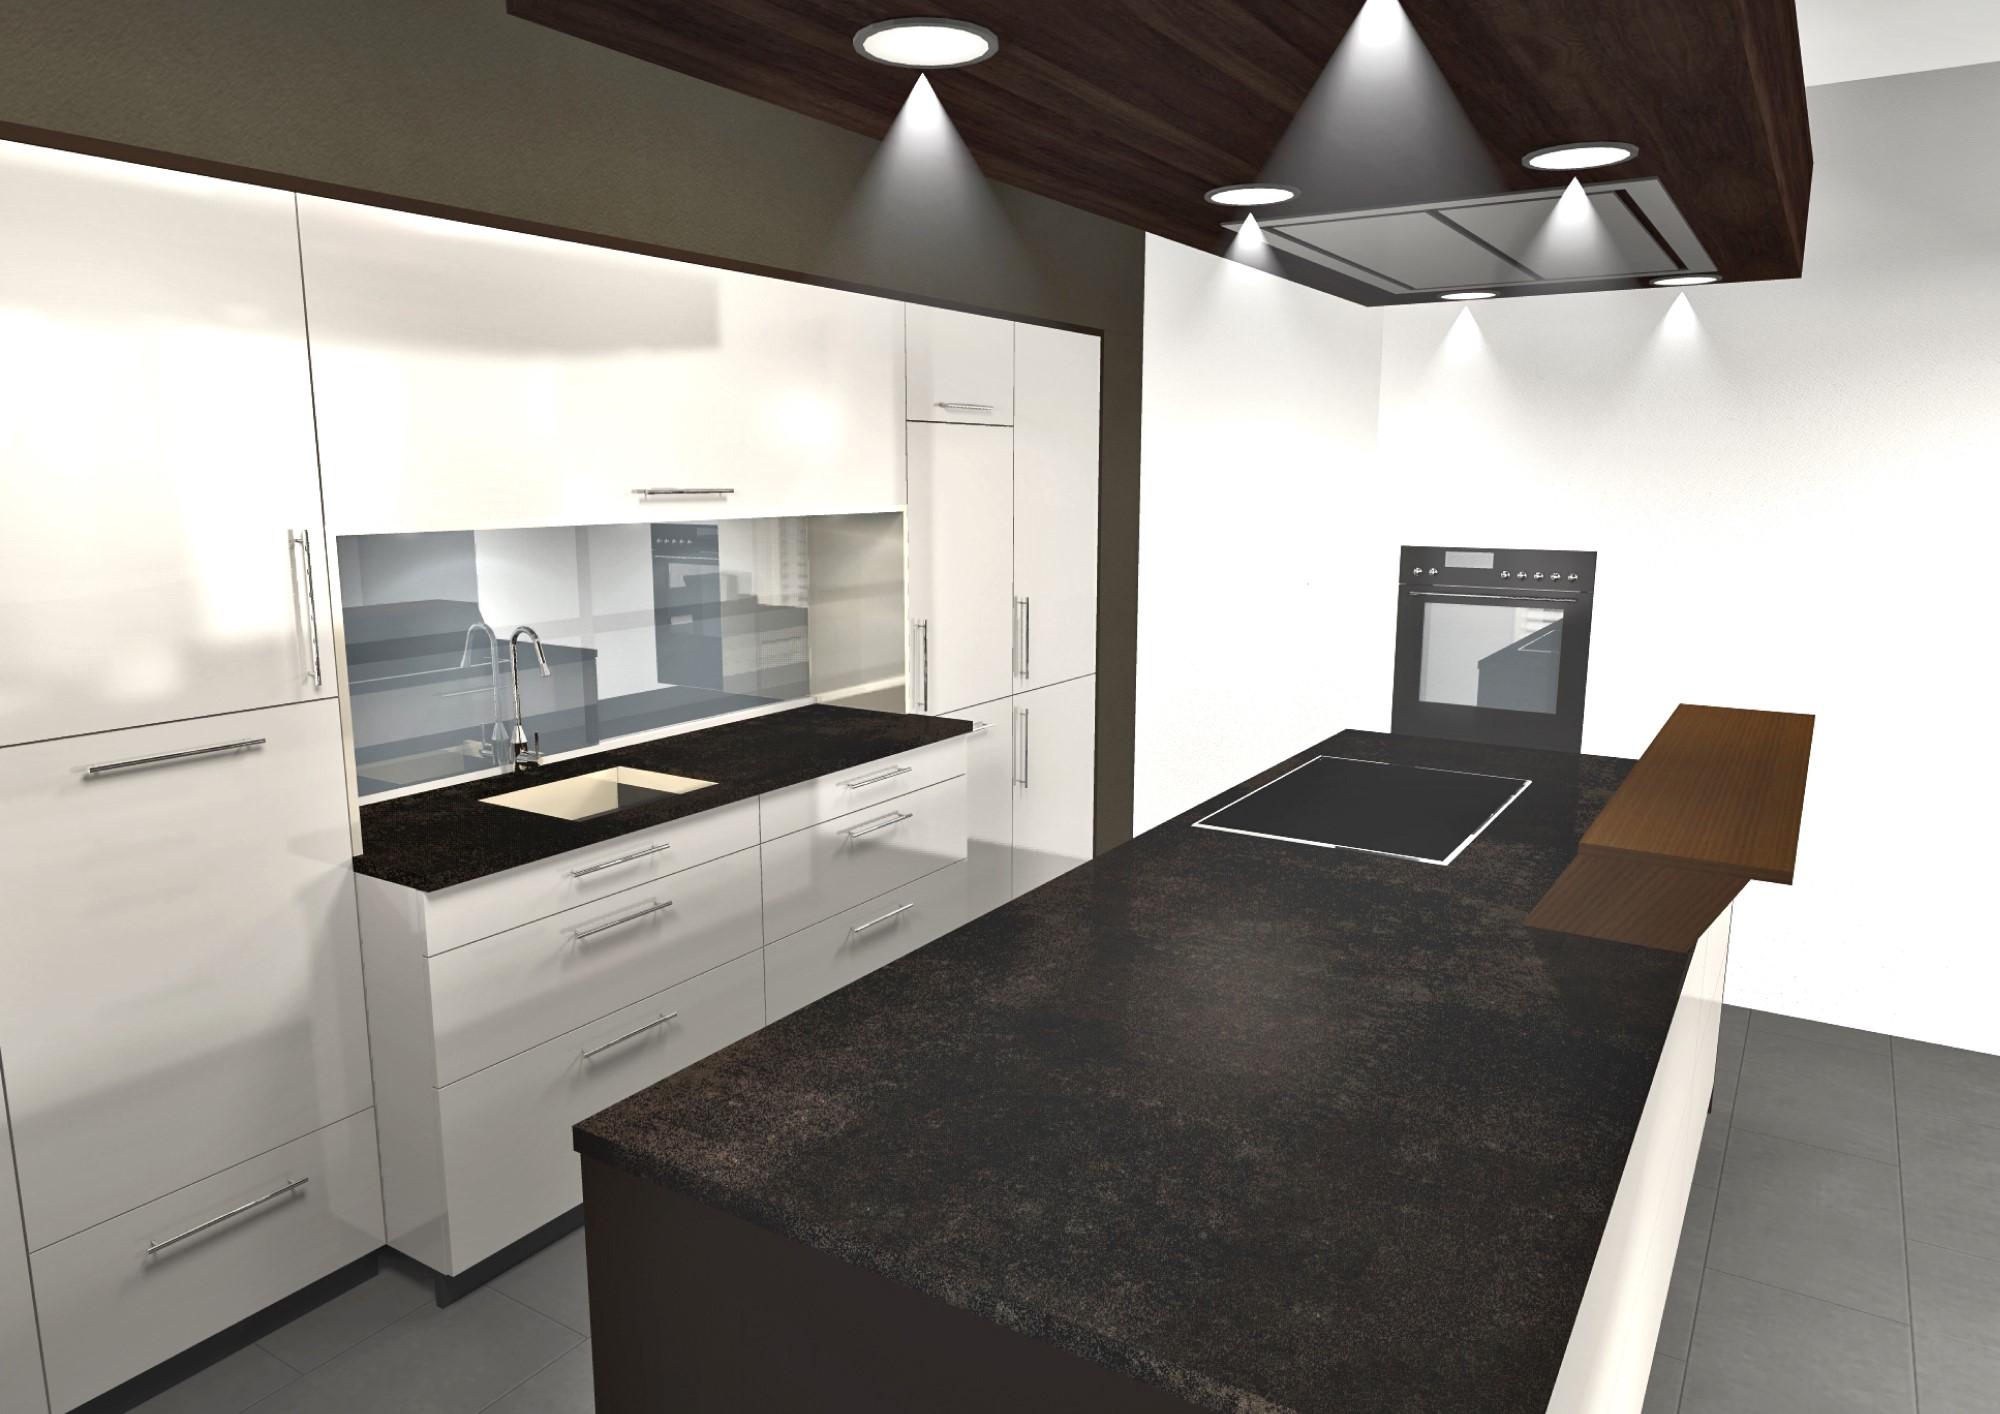 cubic kitchen Planung (5)